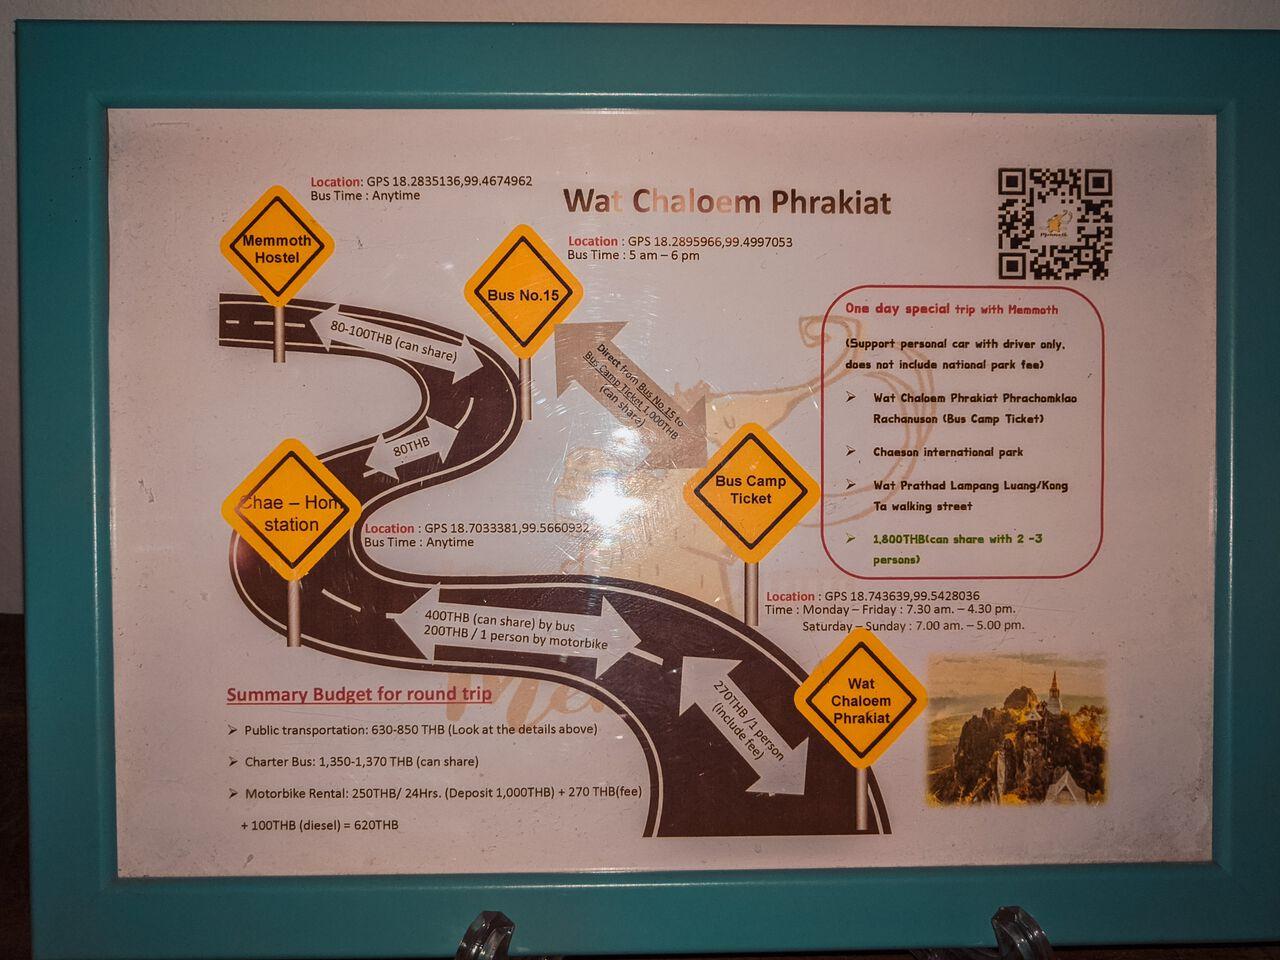 The direction from Lampang City to Wat Chaloem Phra Kiat using public transportation in Lampang, Thailand.